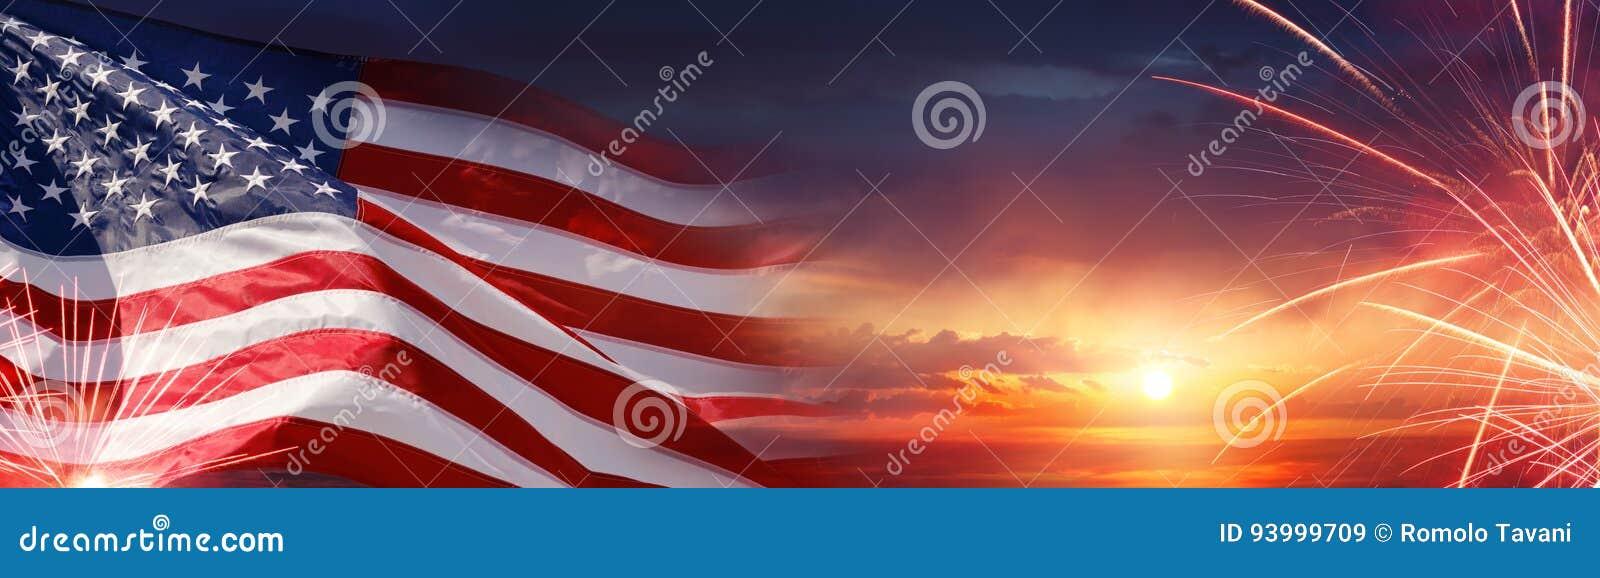 American Celebration - Usa Flag And Fireworks